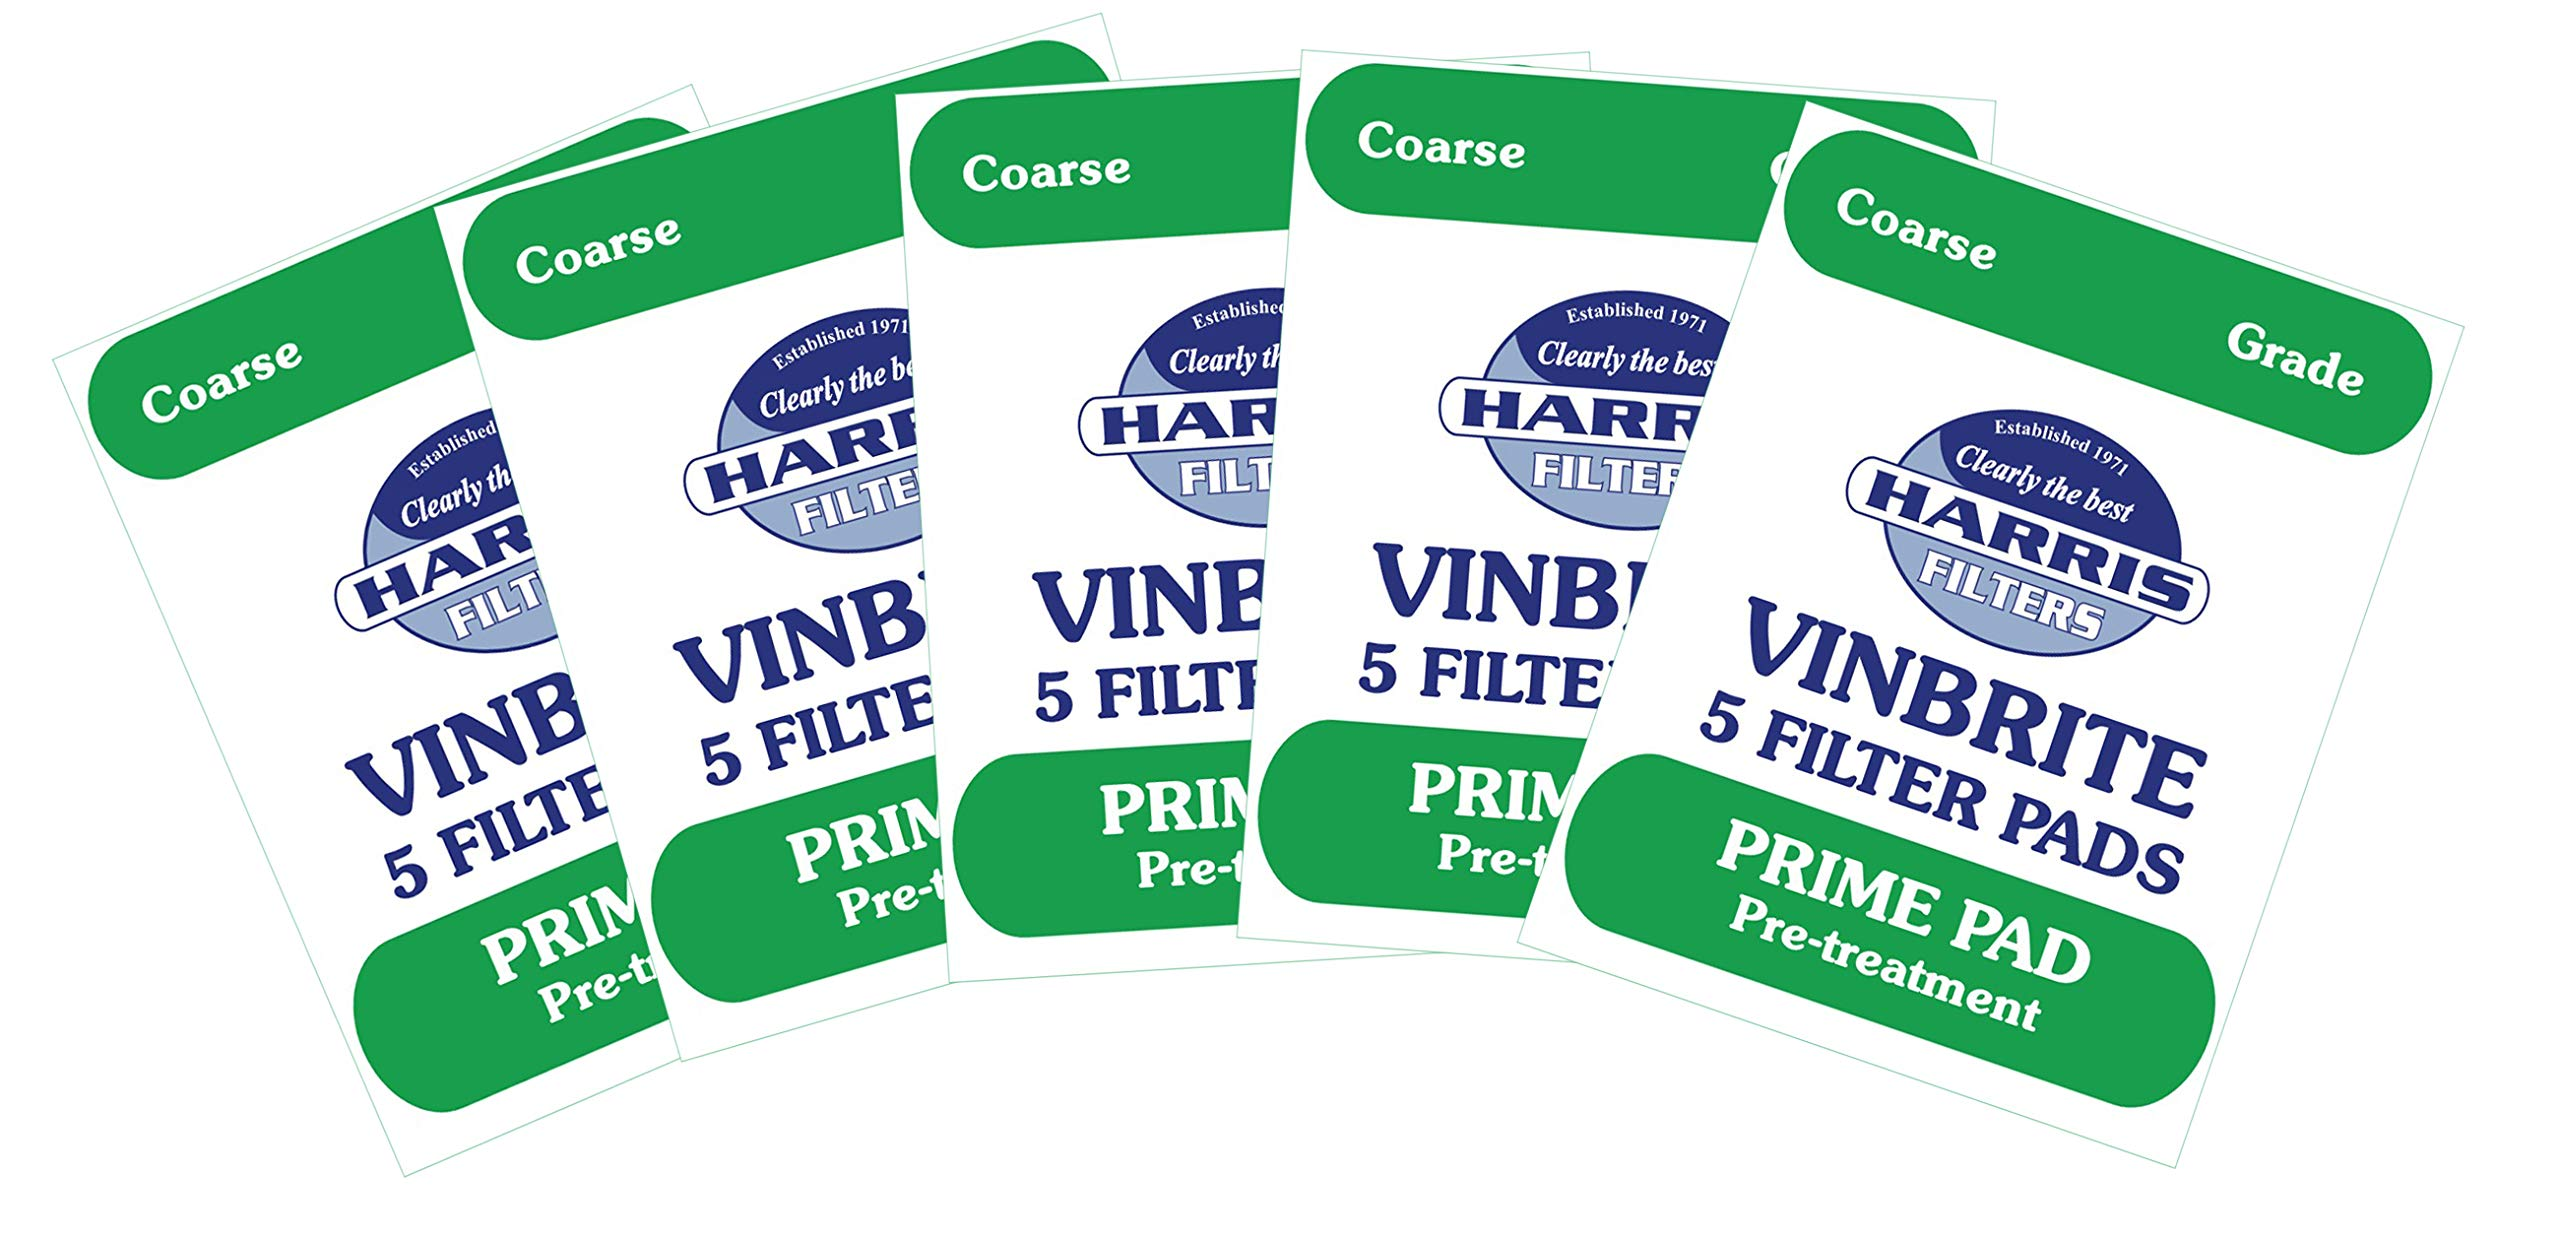 5x Harris Prime Pre-Filter Pads 5-pack Use with Harris Vinbrite MK3 Filter Kit